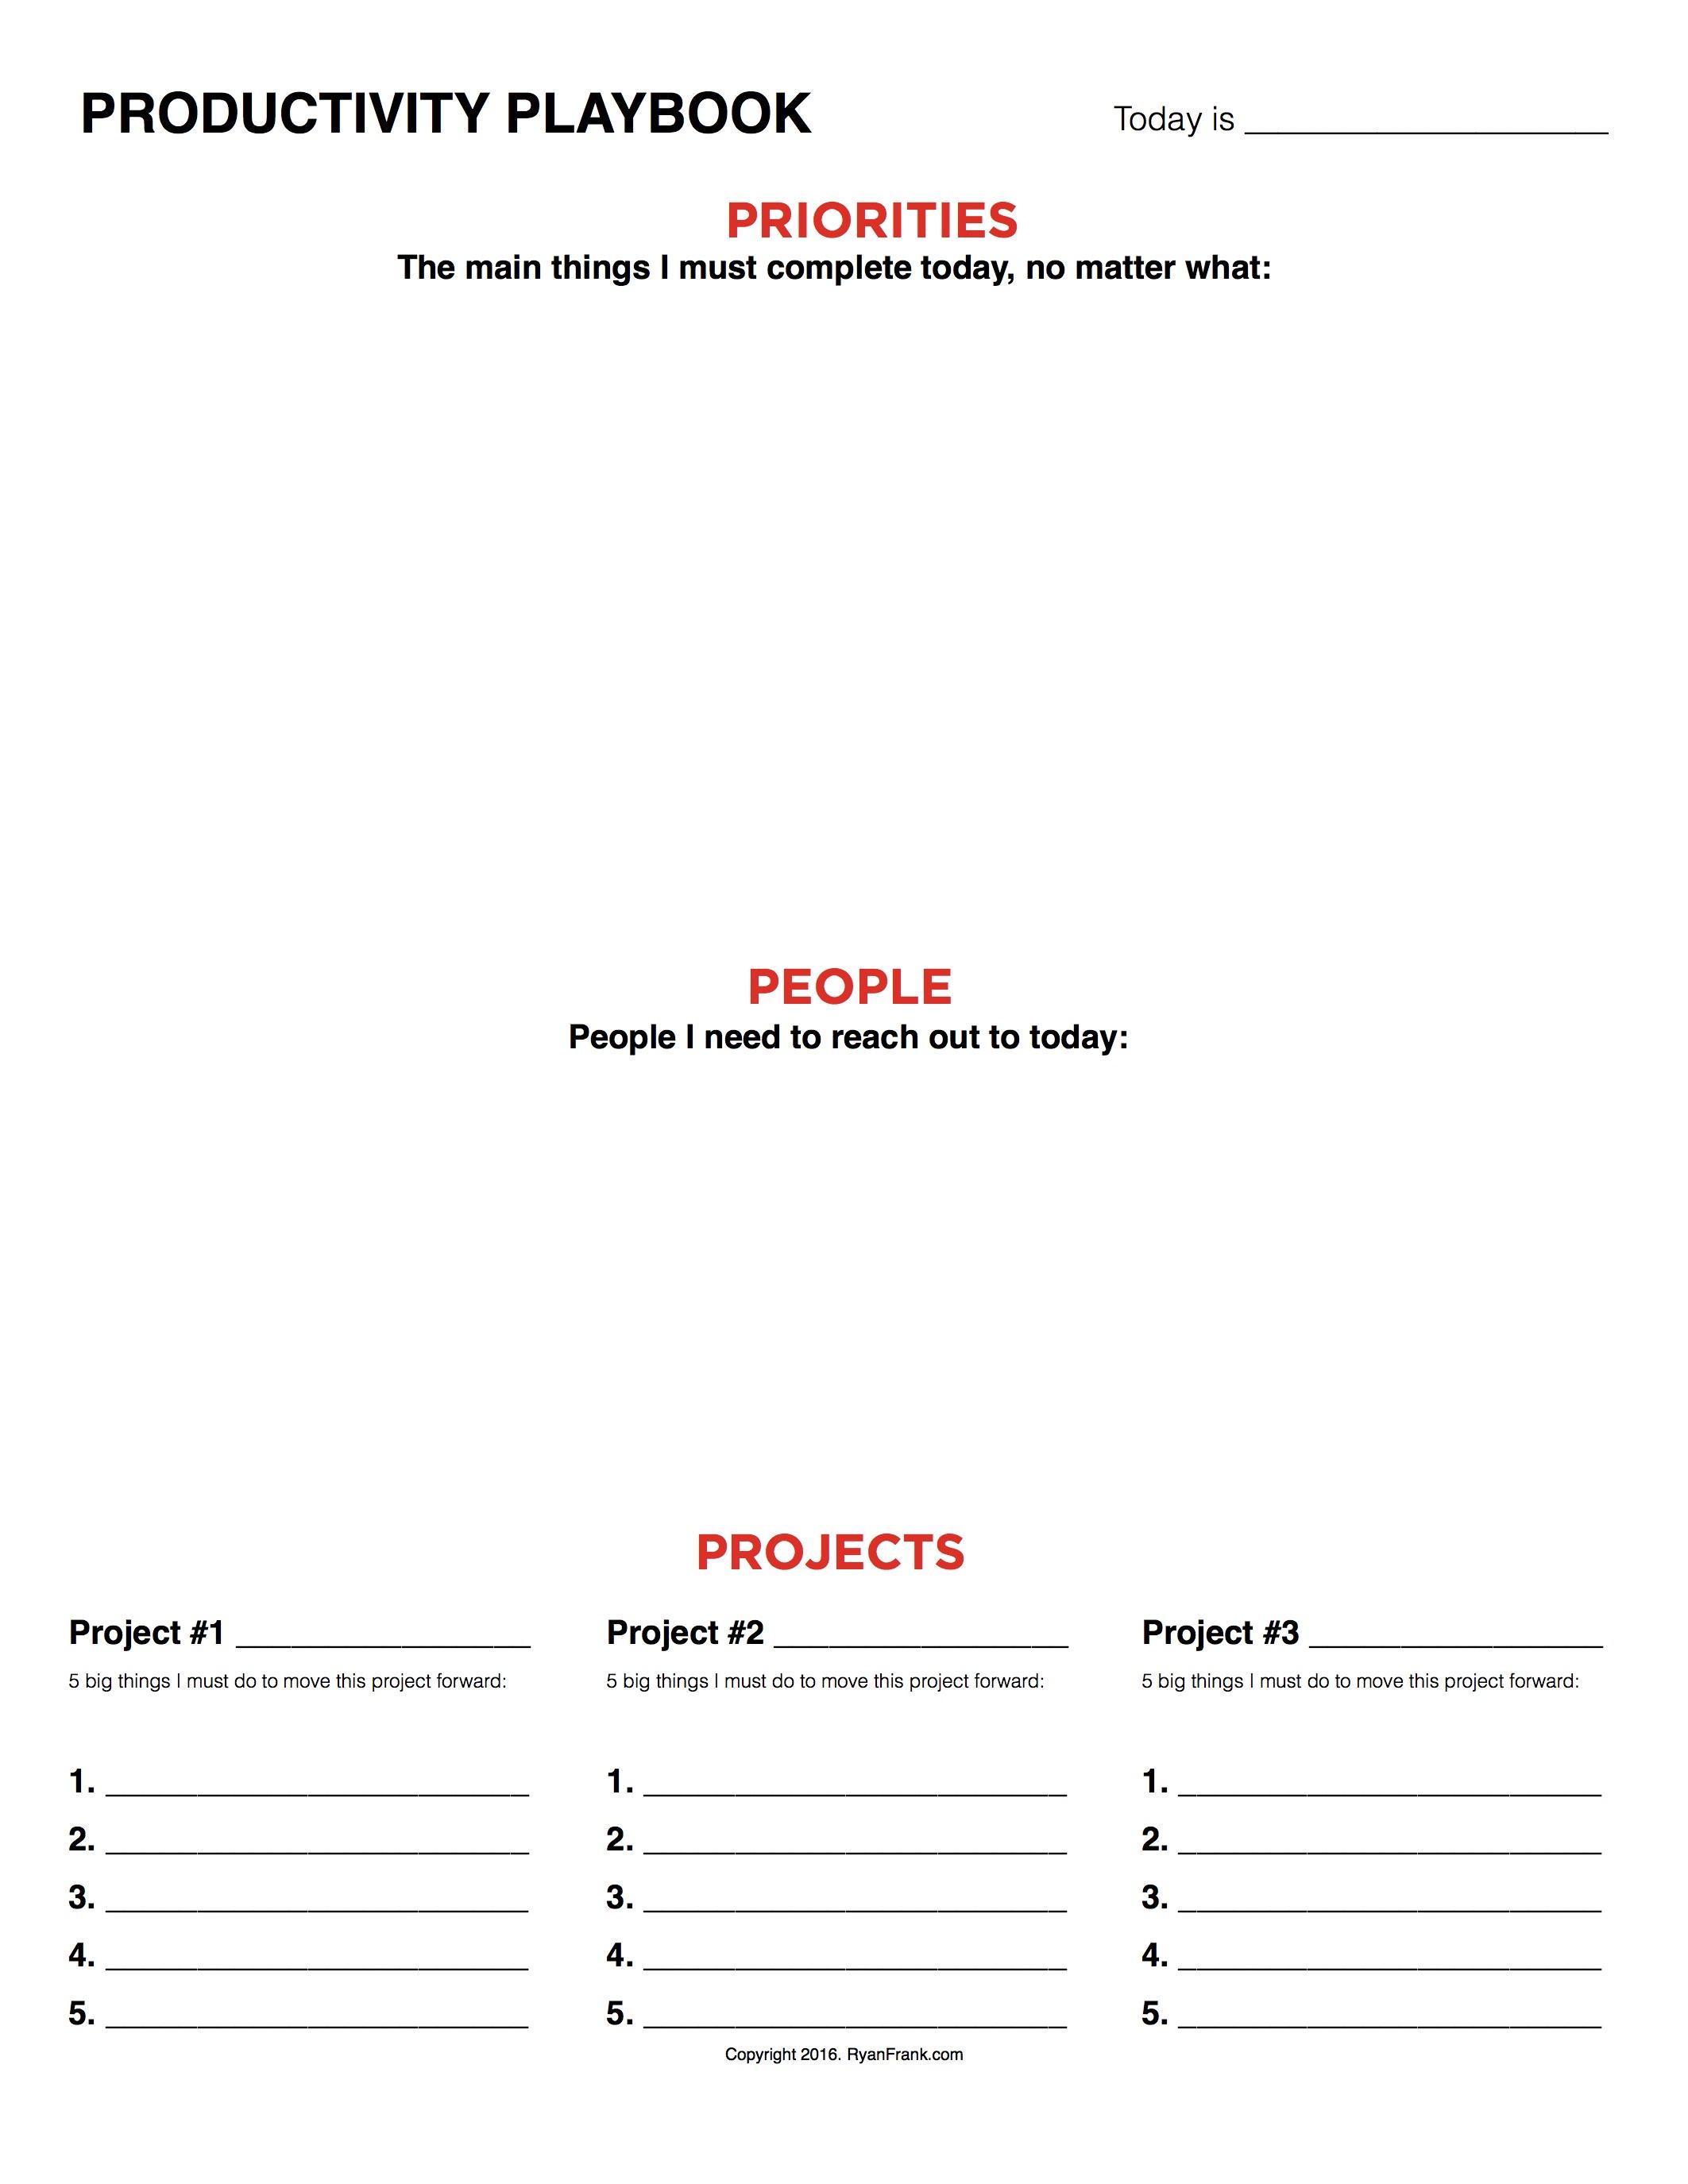 productivity-playbook-image.jpg